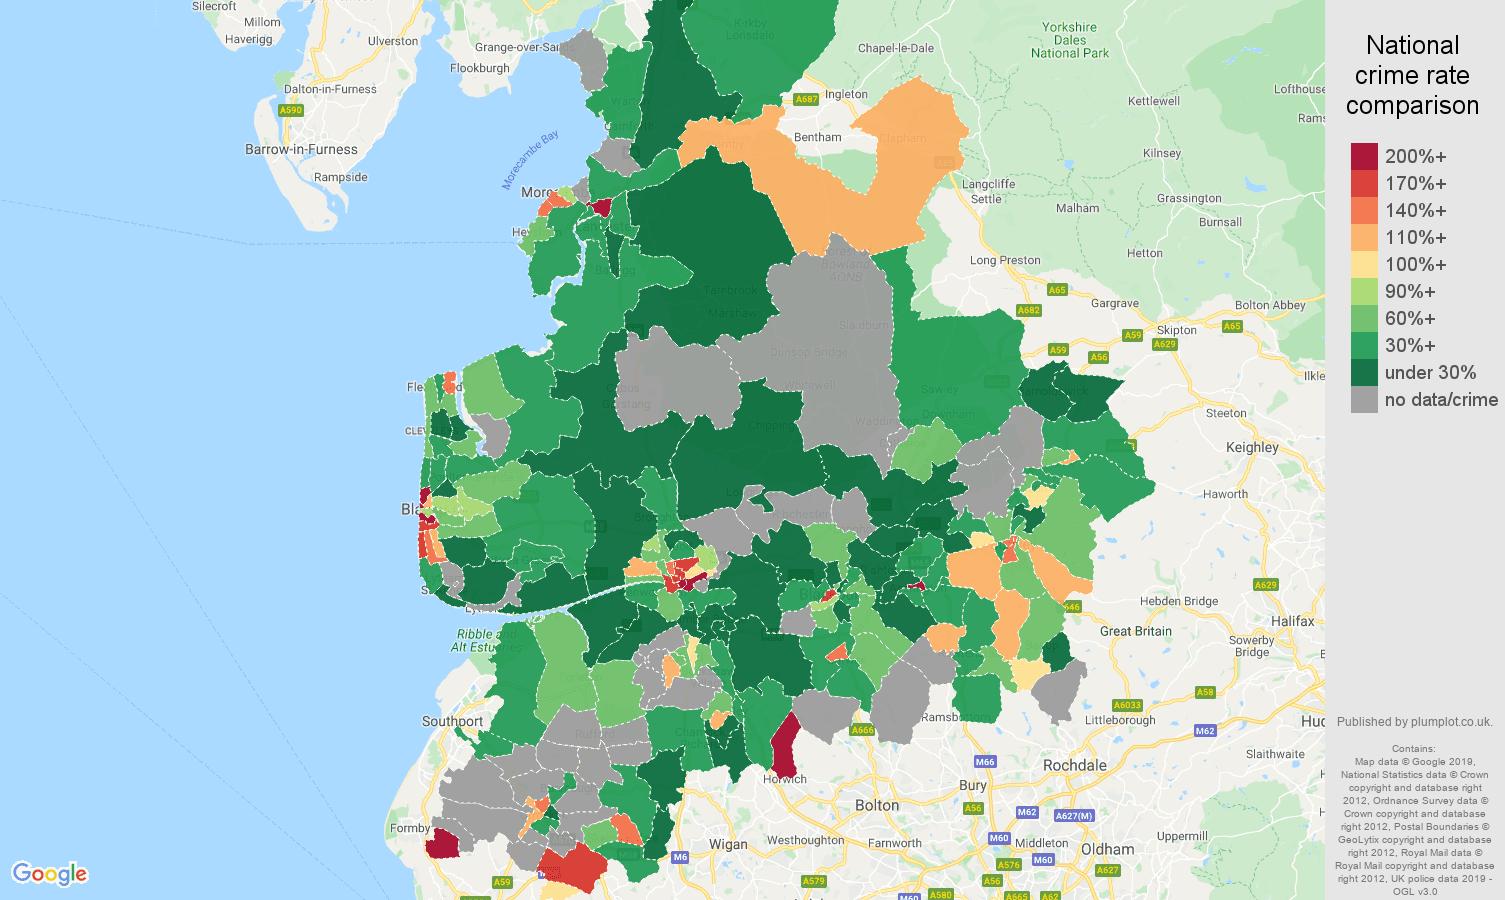 Lancashire possession of weapons crime rate comparison map